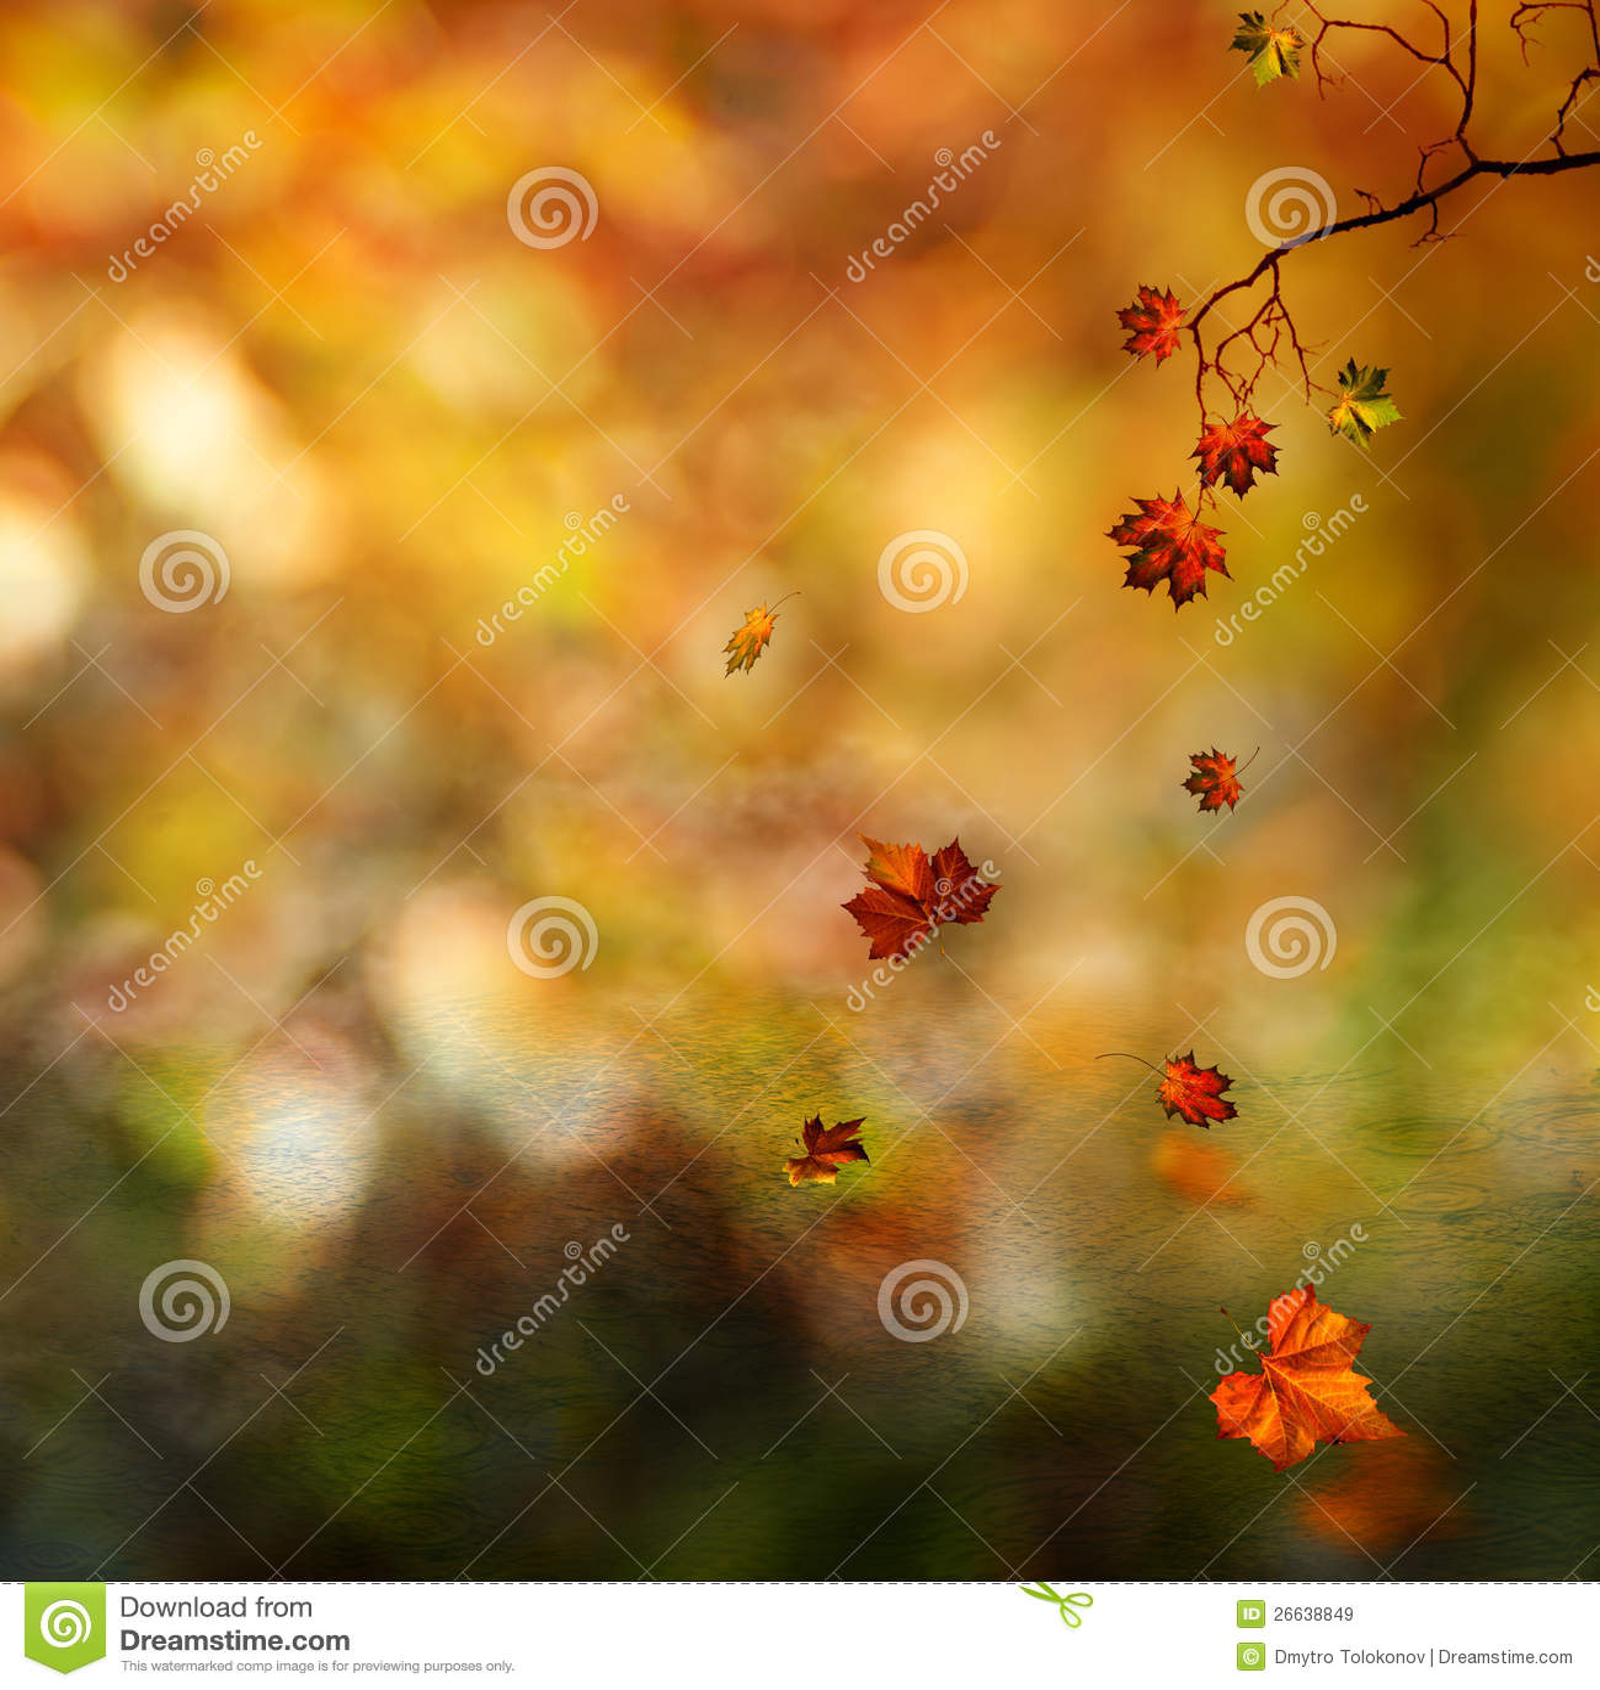 Autumn, Abstract Natural Background Stock Illustration